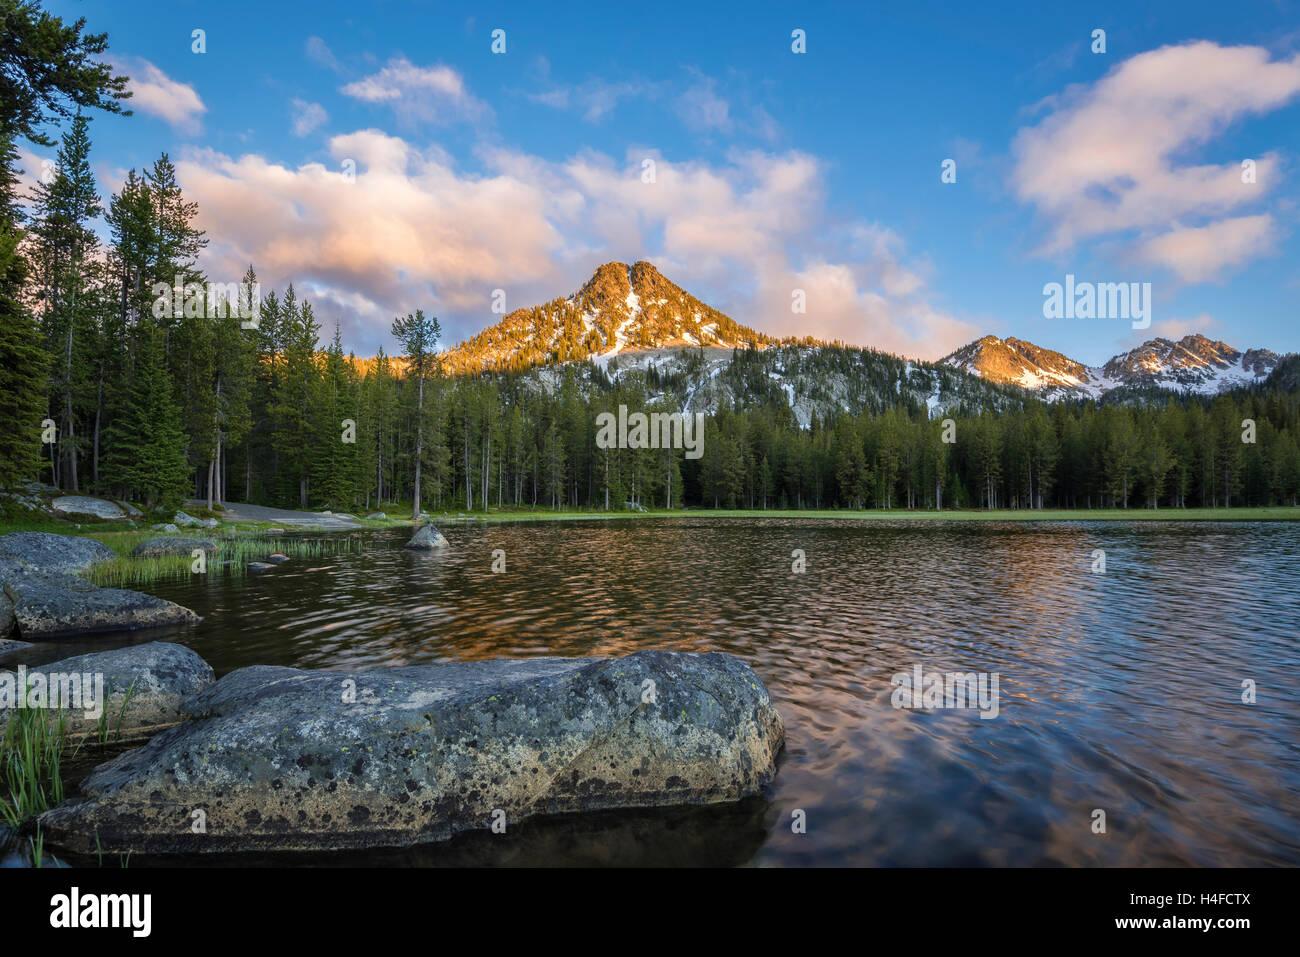 Anthony lago e montagna Gunsight, Elkhorn montagne, Wallowa-Whitman National Forest, Oregon orientale. Immagini Stock